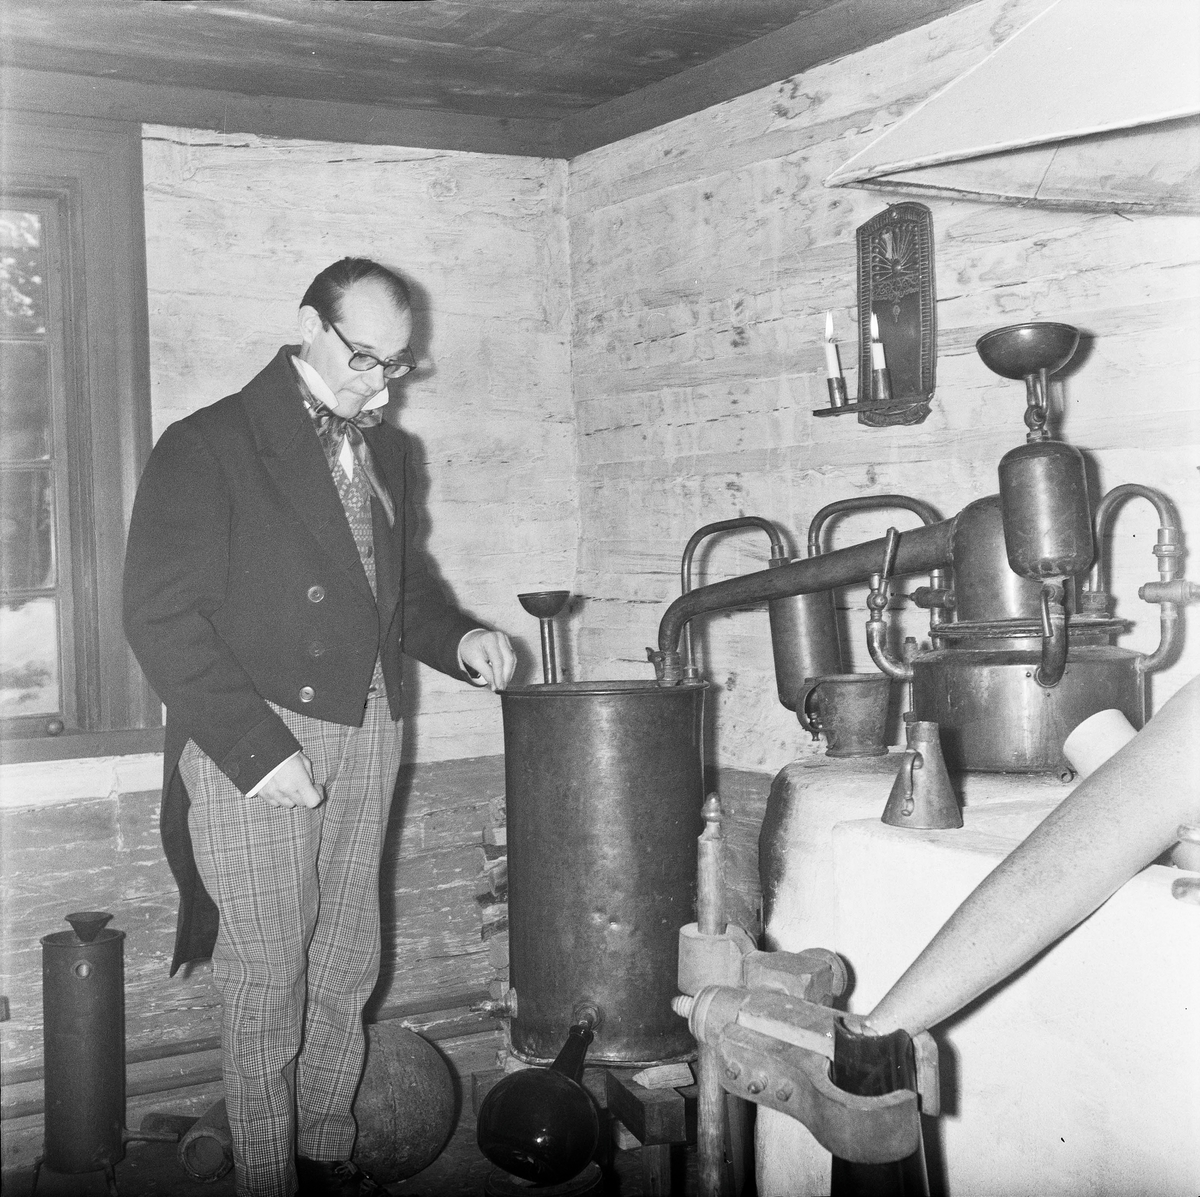 Apoteket på Skansen. Destillering. Pedagog